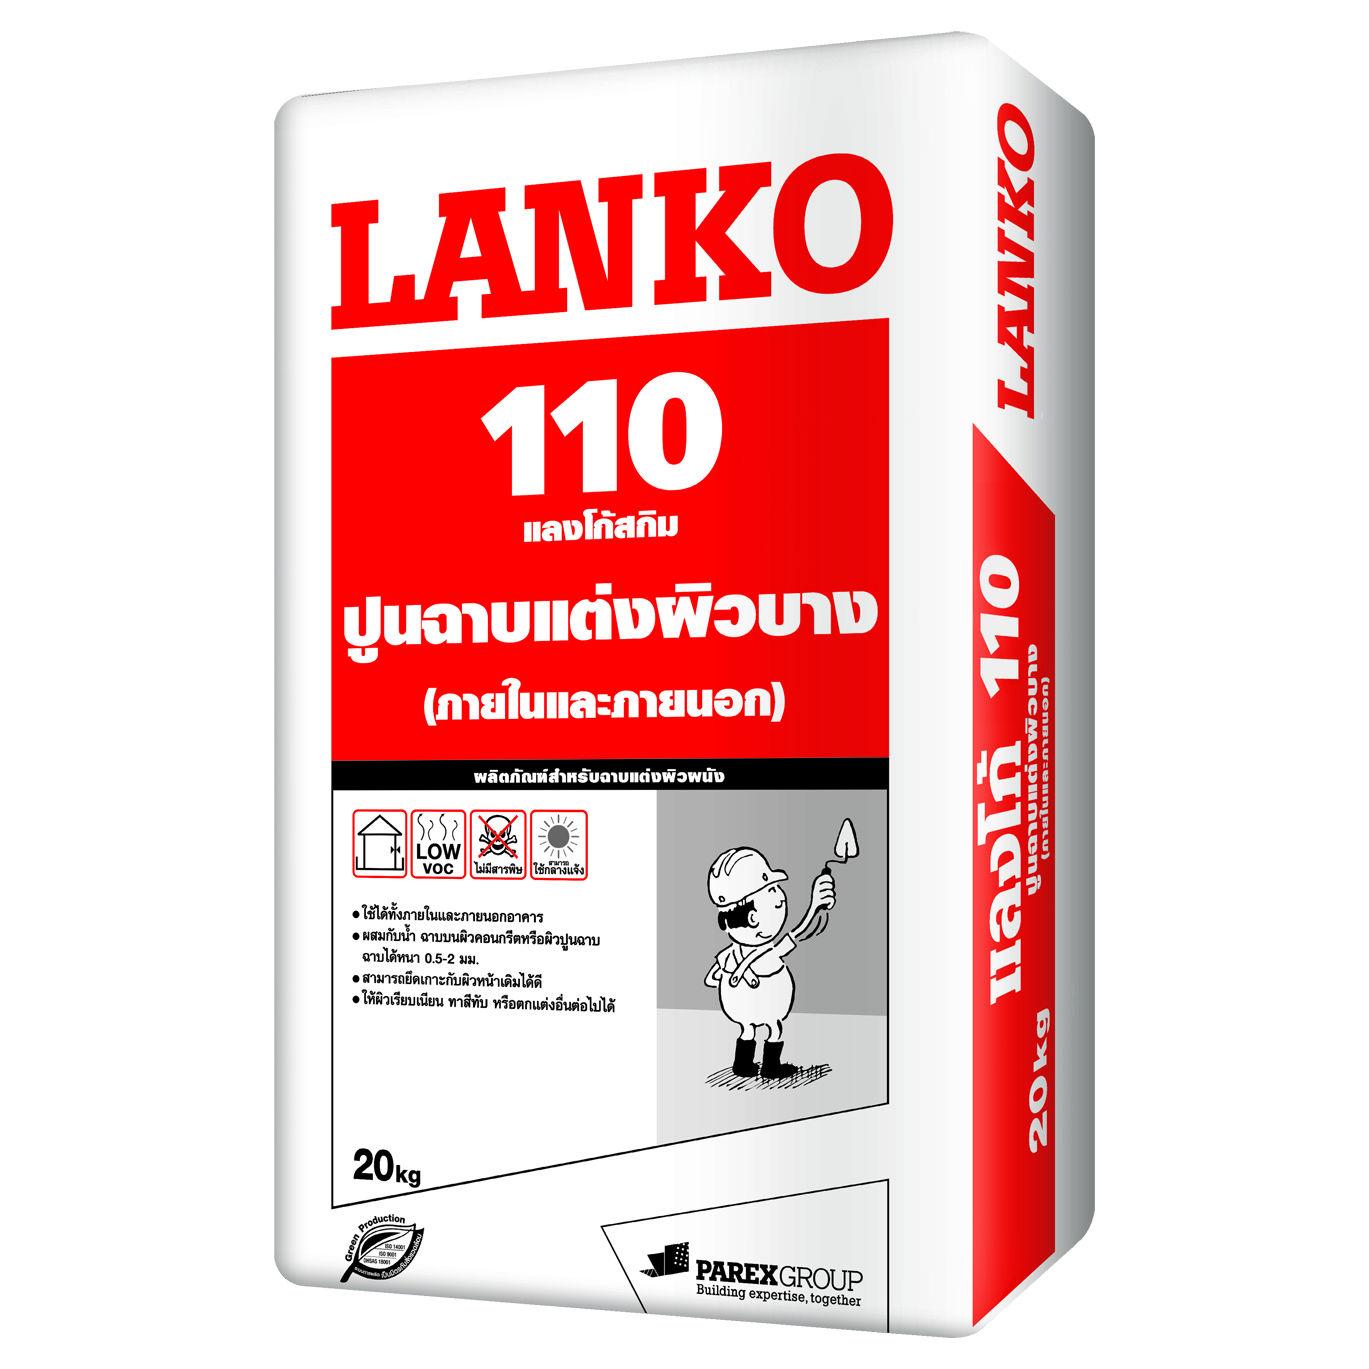 LANKO 110 Grey